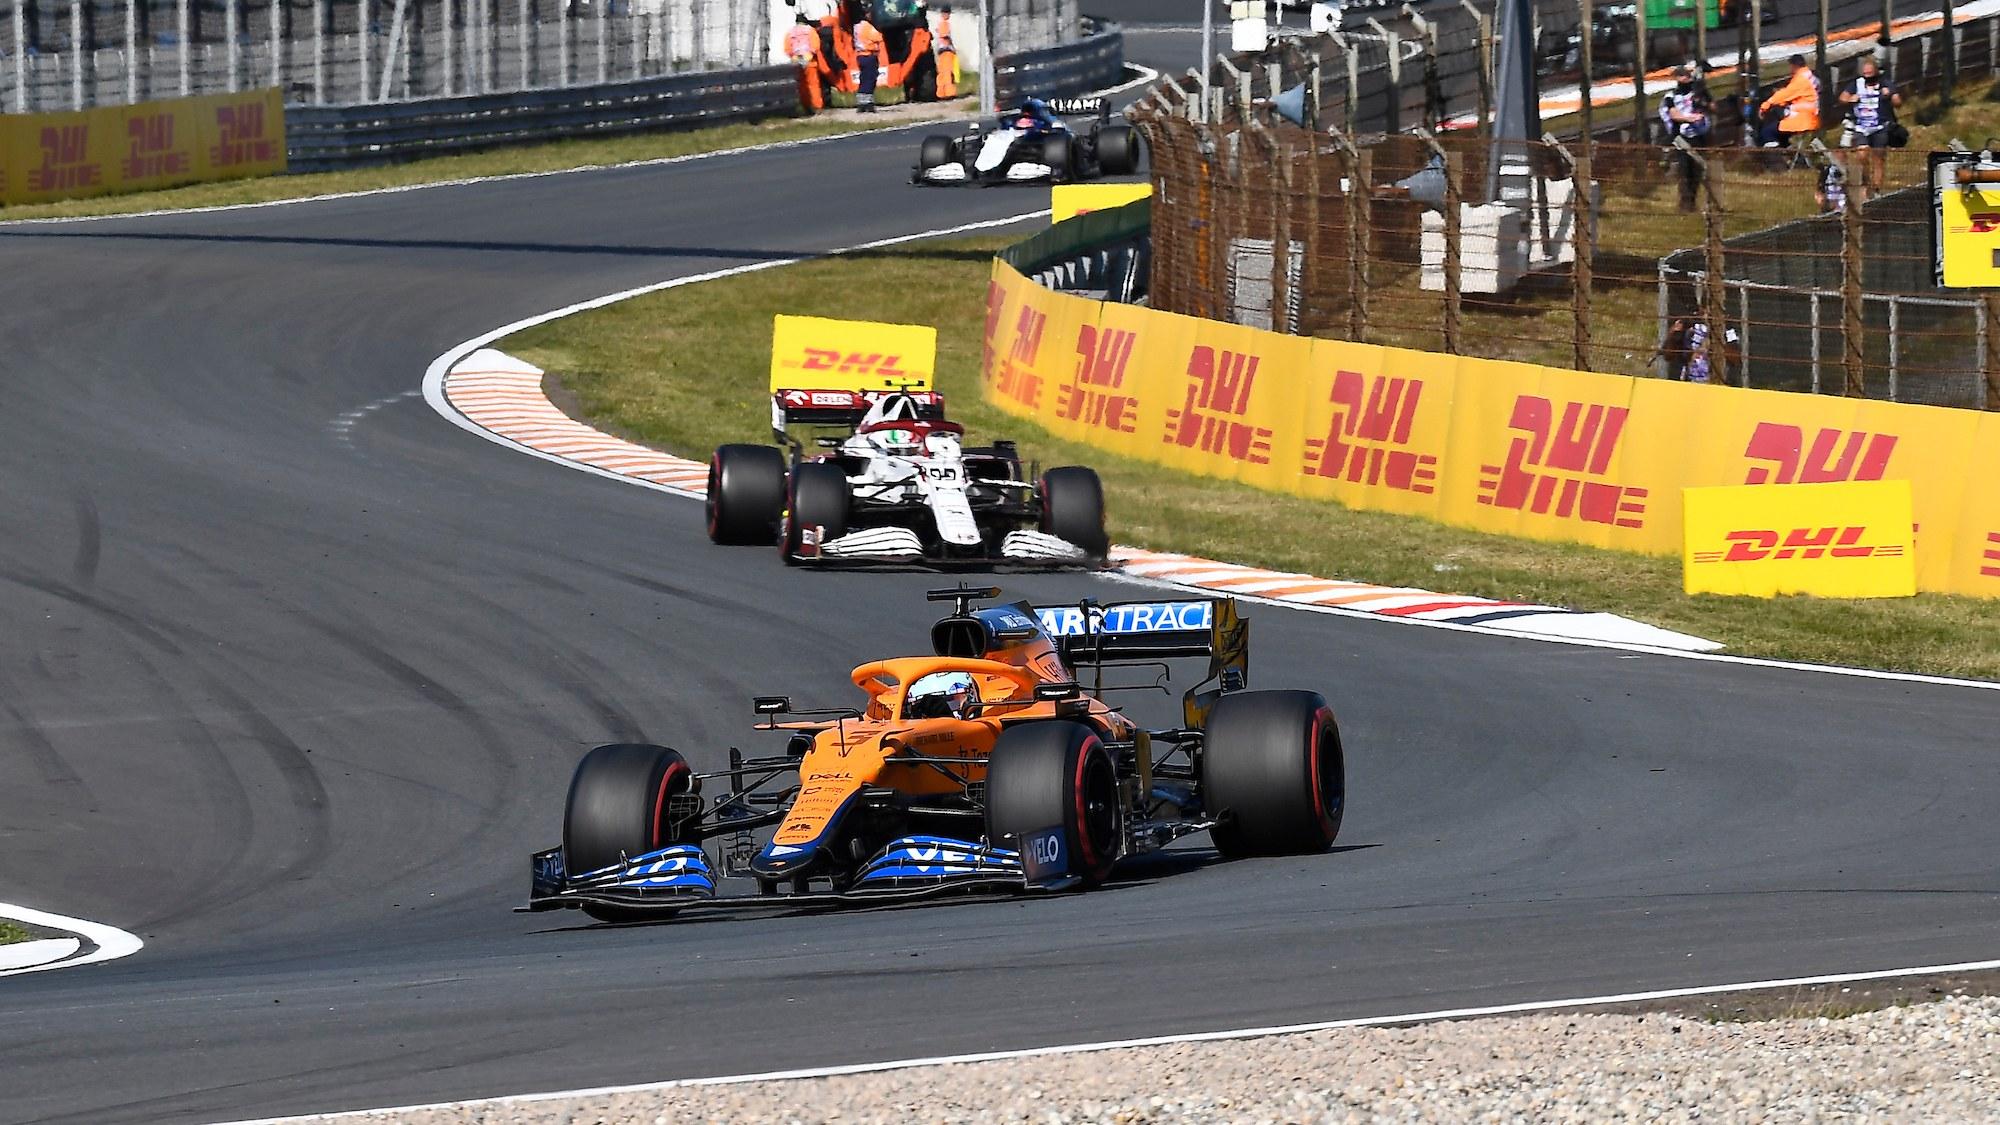 Daniel Ricciardo, 2021 Dutch Gp